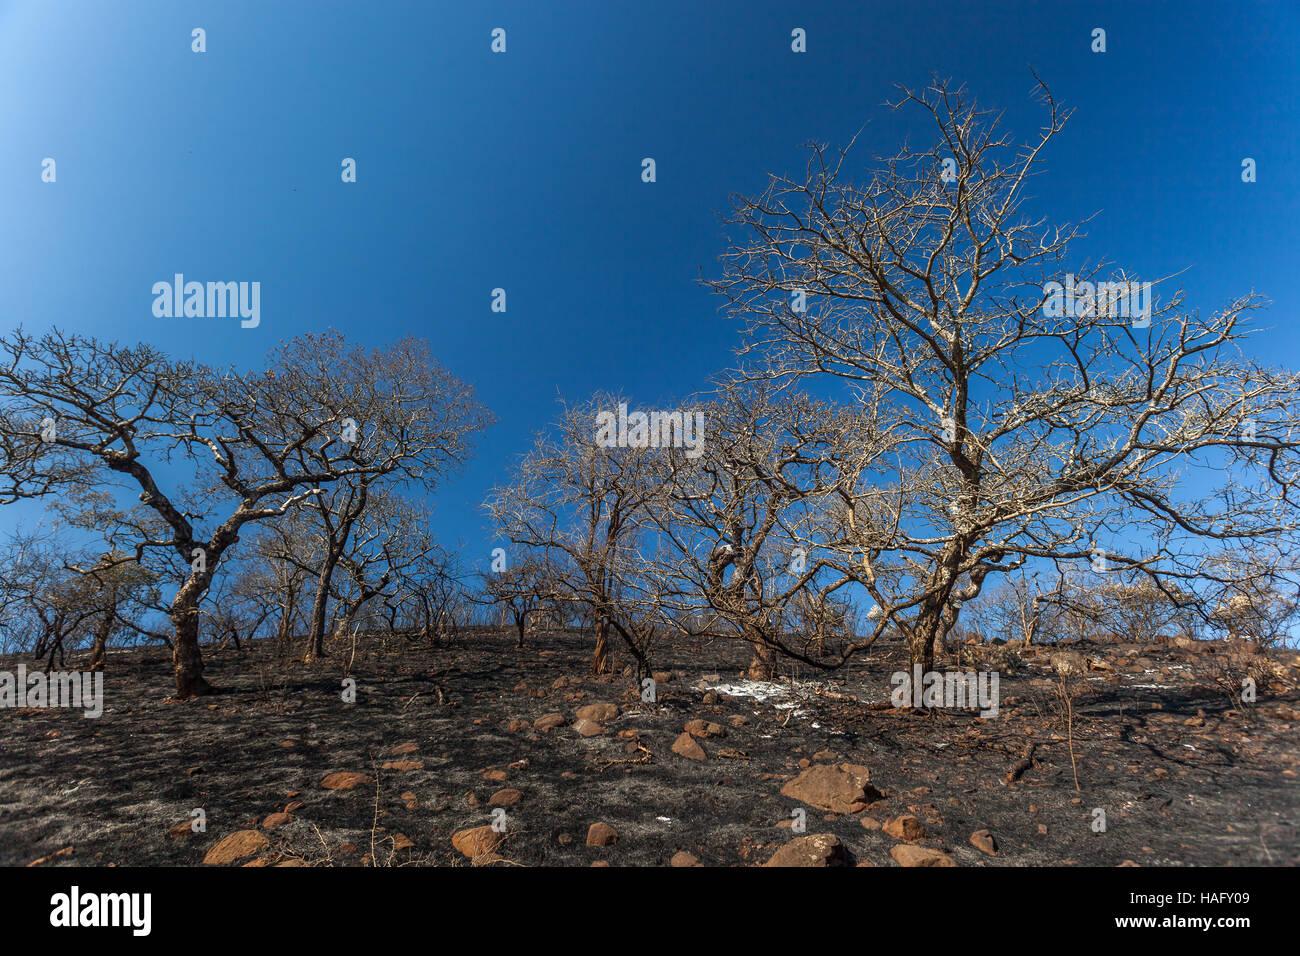 Wilderness fire burned trees grass contrasts on hillside landscape against blue sky - Stock Image